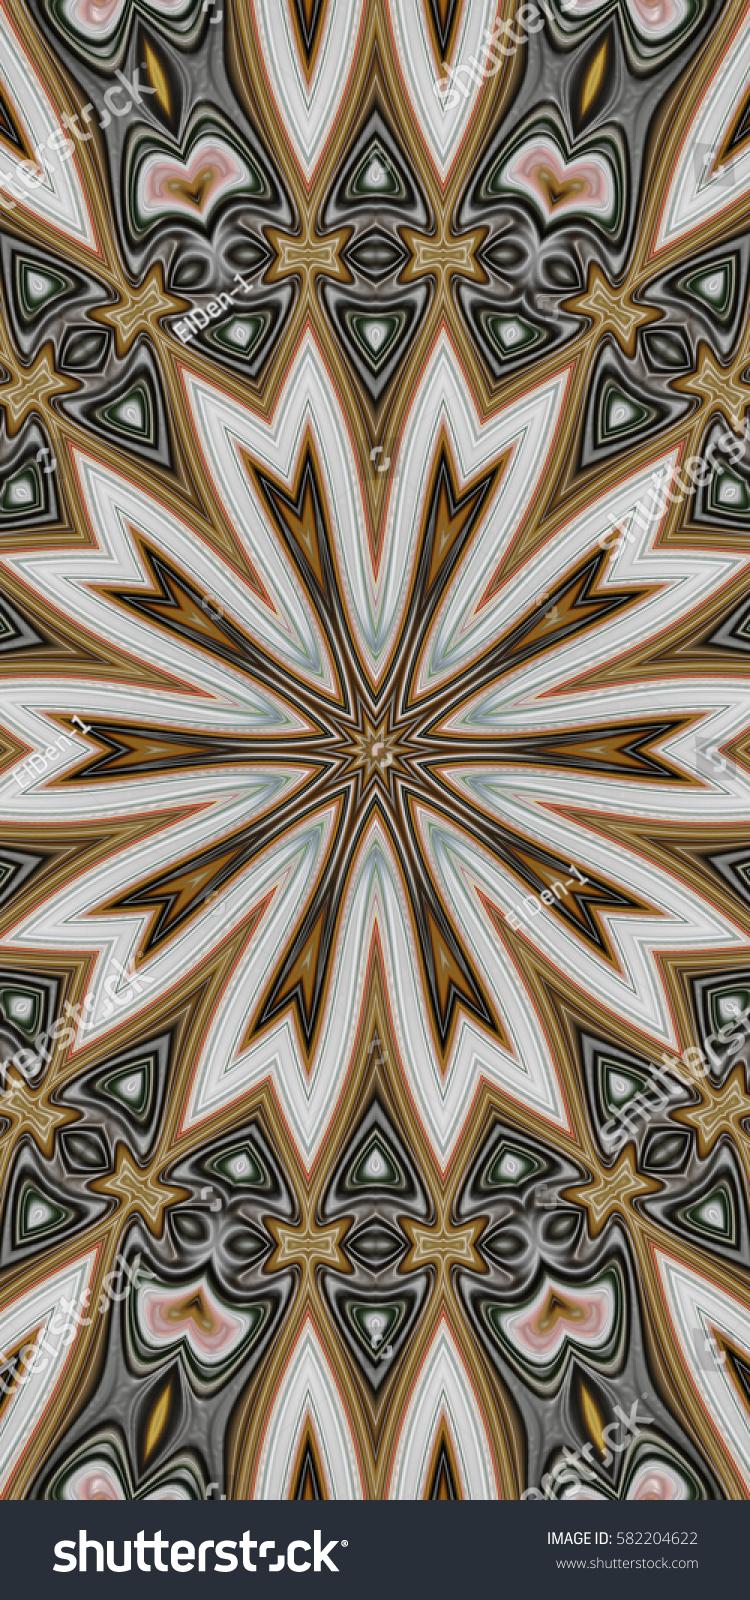 Royalty Free Stock Illustration Of Modern Floral Pattern